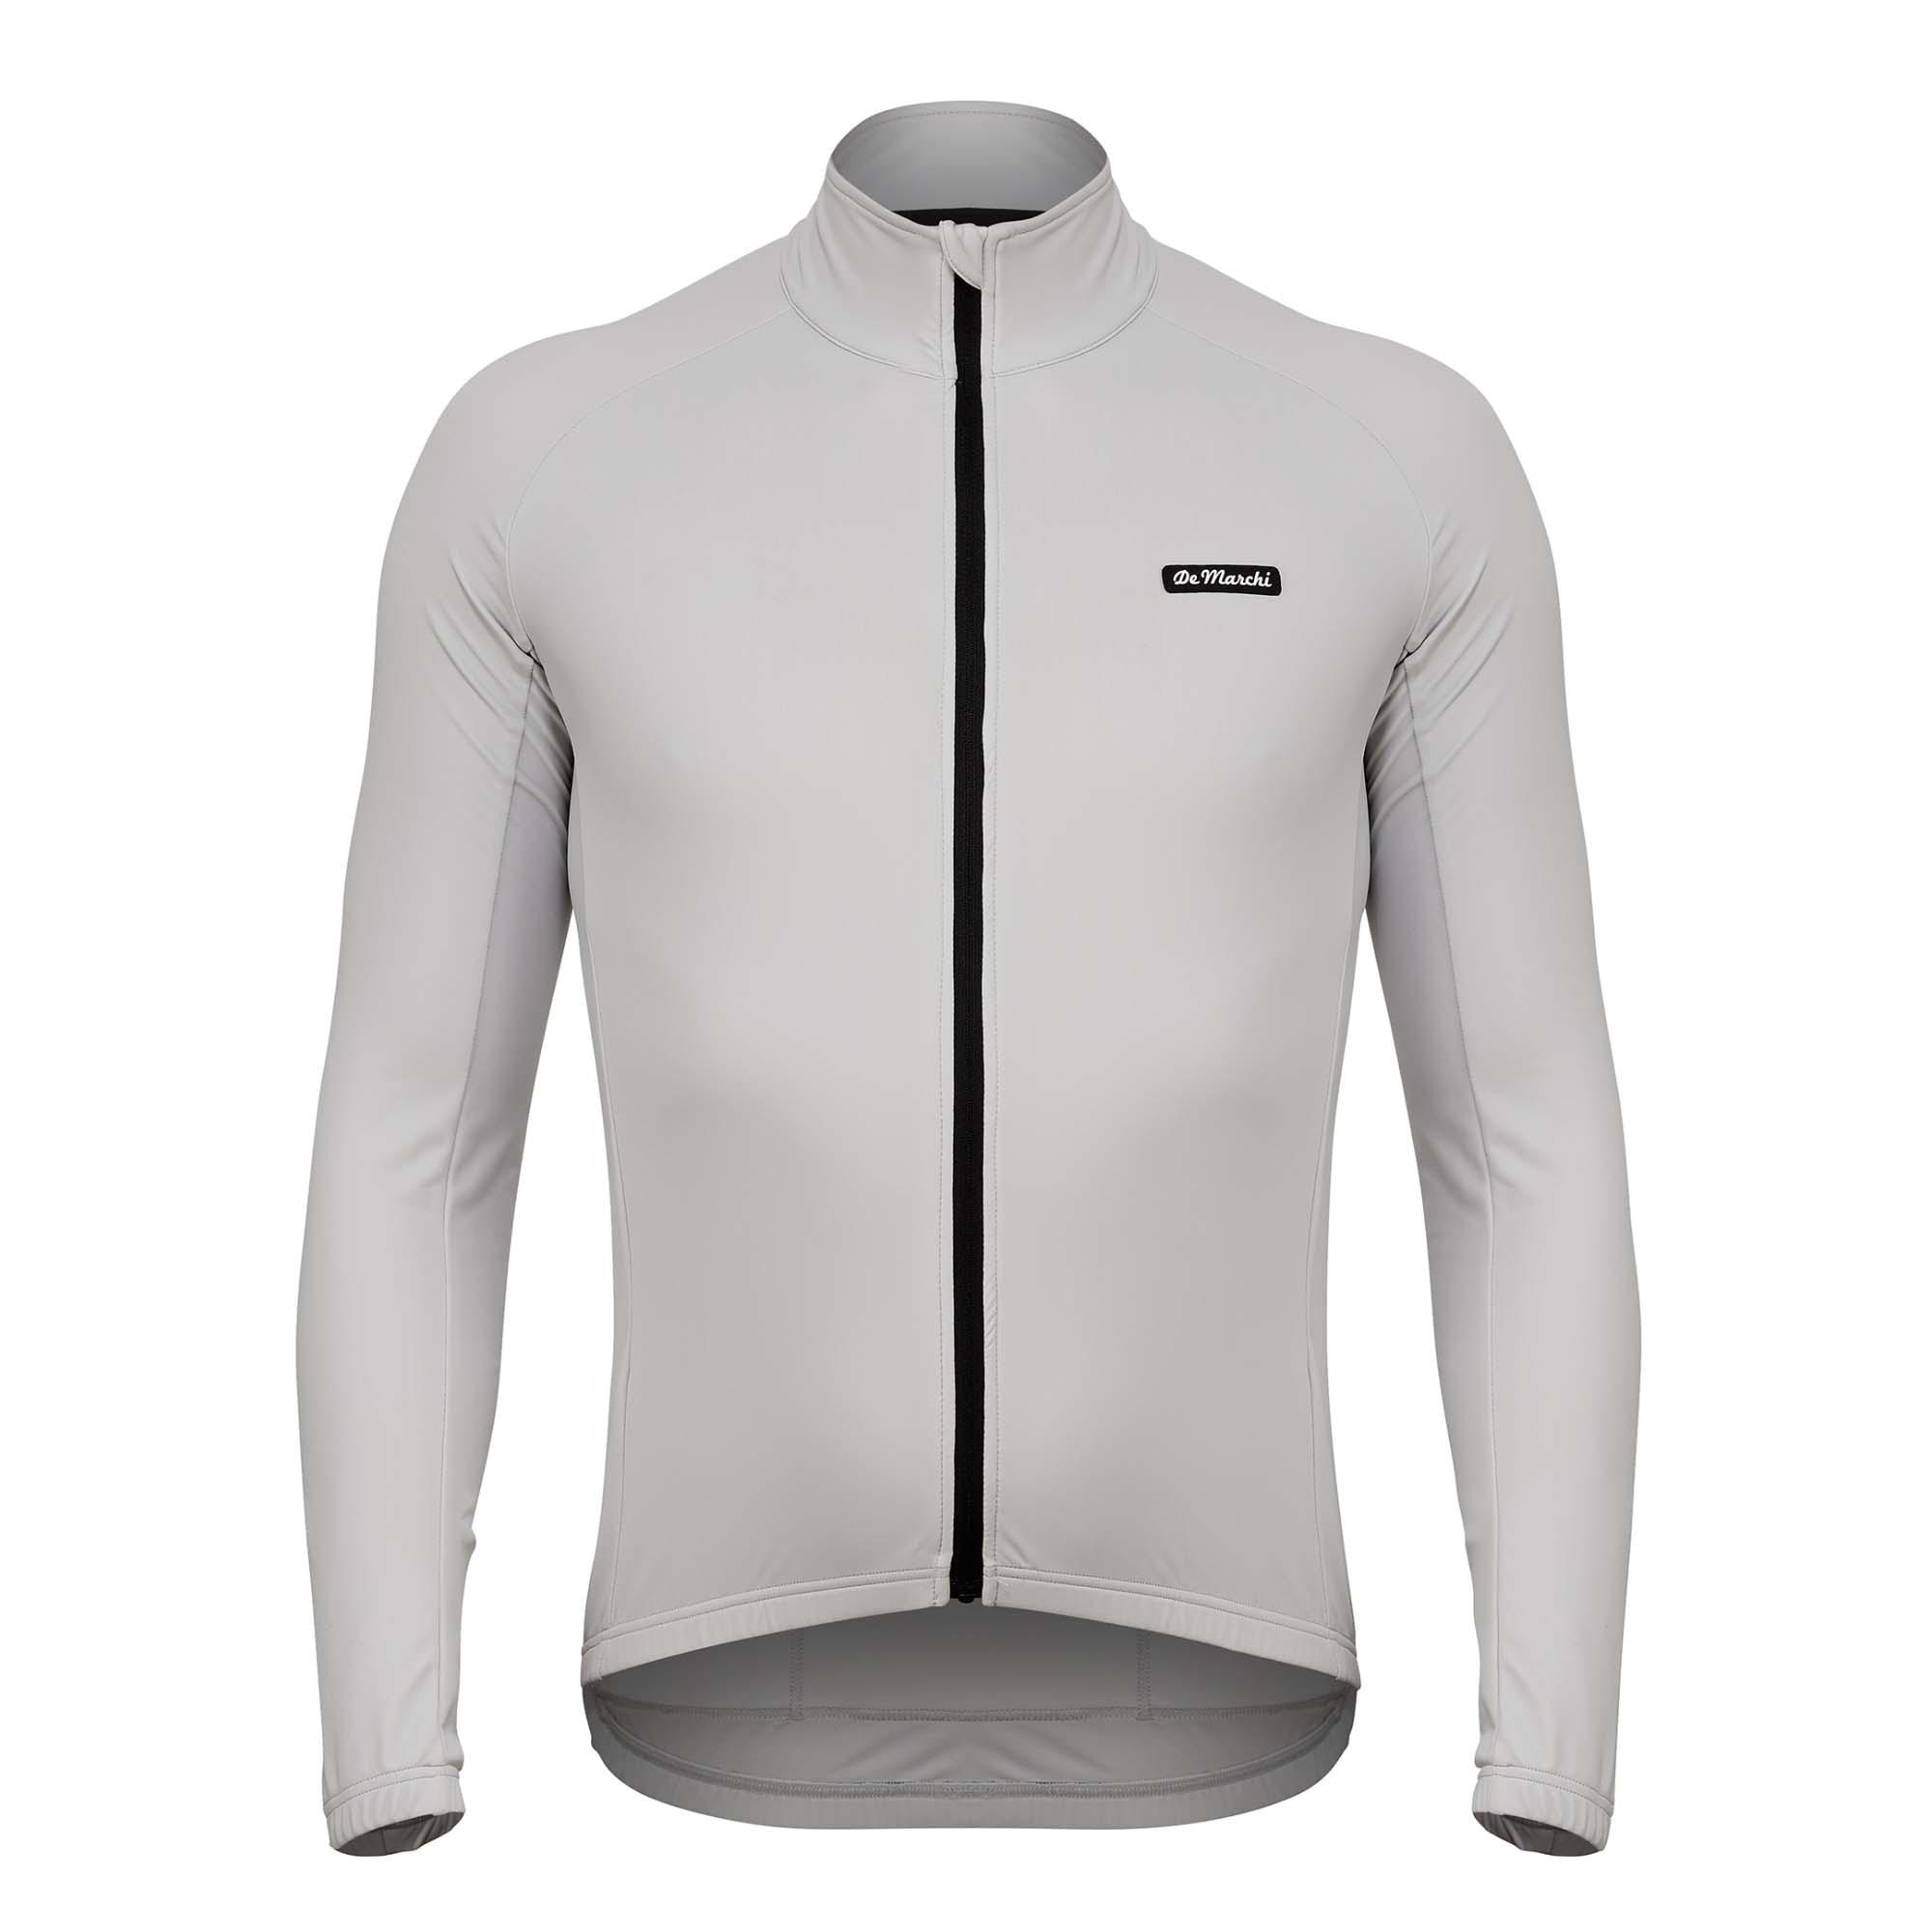 De marchi ciclismo jersey de invierno de manga larga de lana chaqueta...